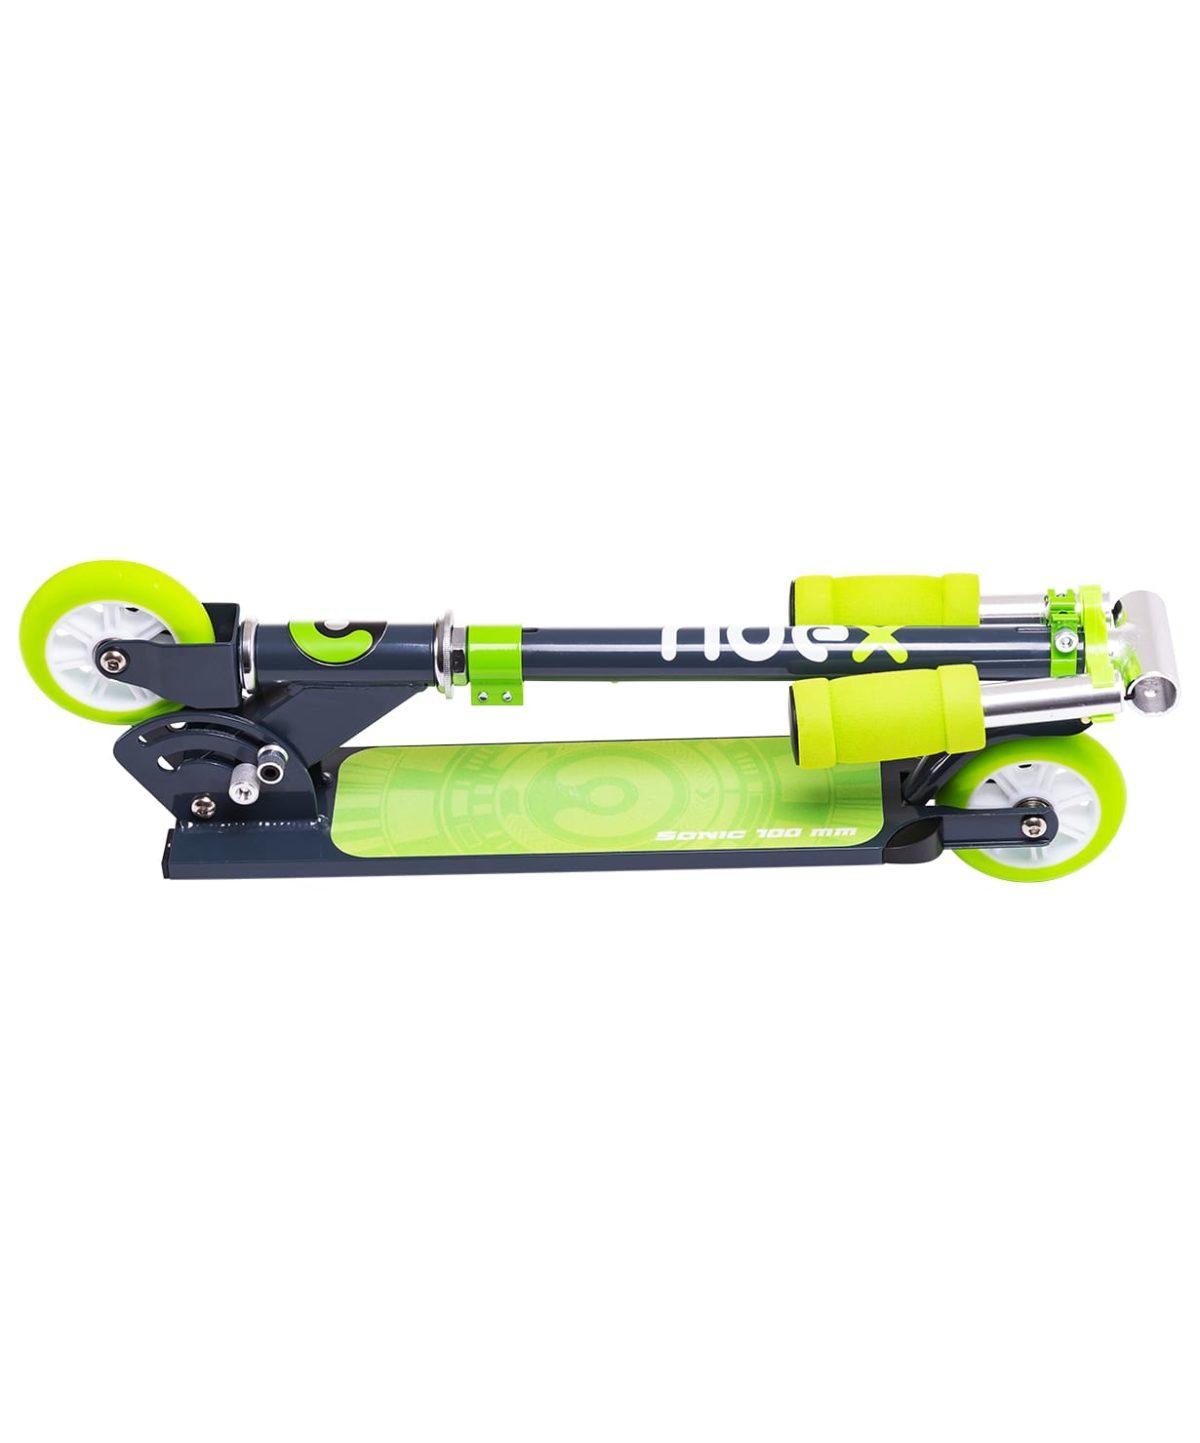 RIDEX Sonic Самокат 2-колесный  100 мм  Sonic: зелёный - 6